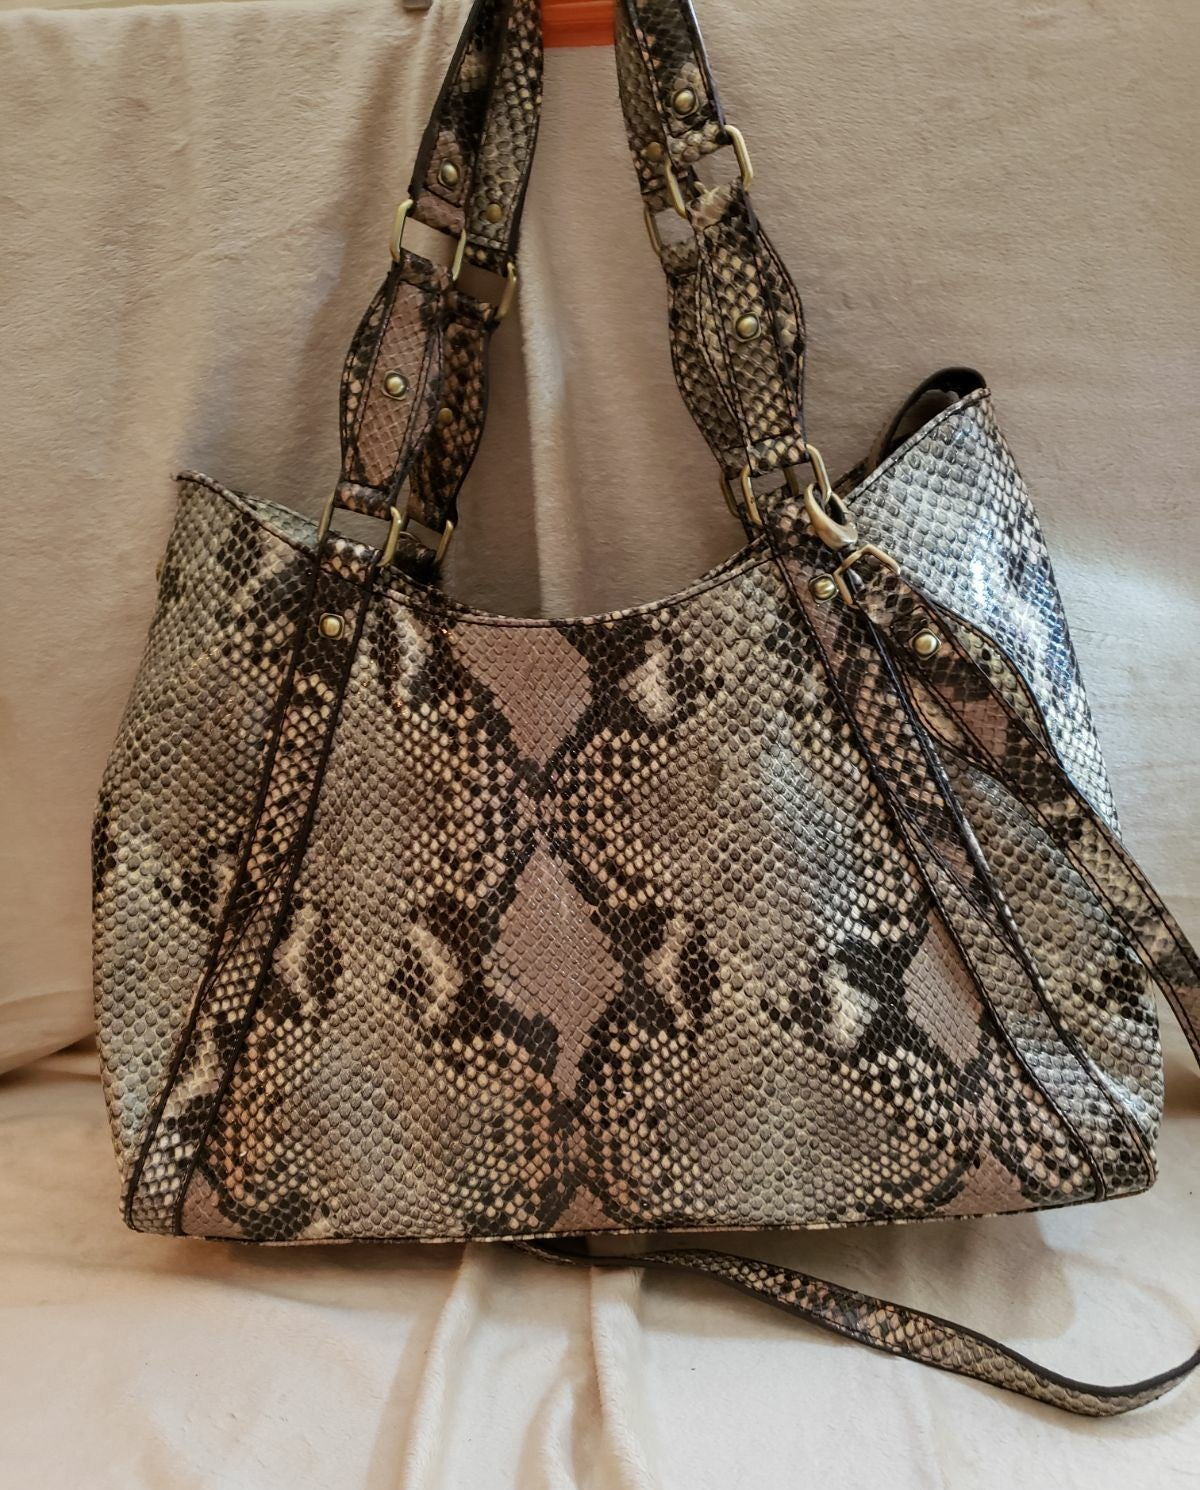 Gretta Faux Snakeskin Handbag